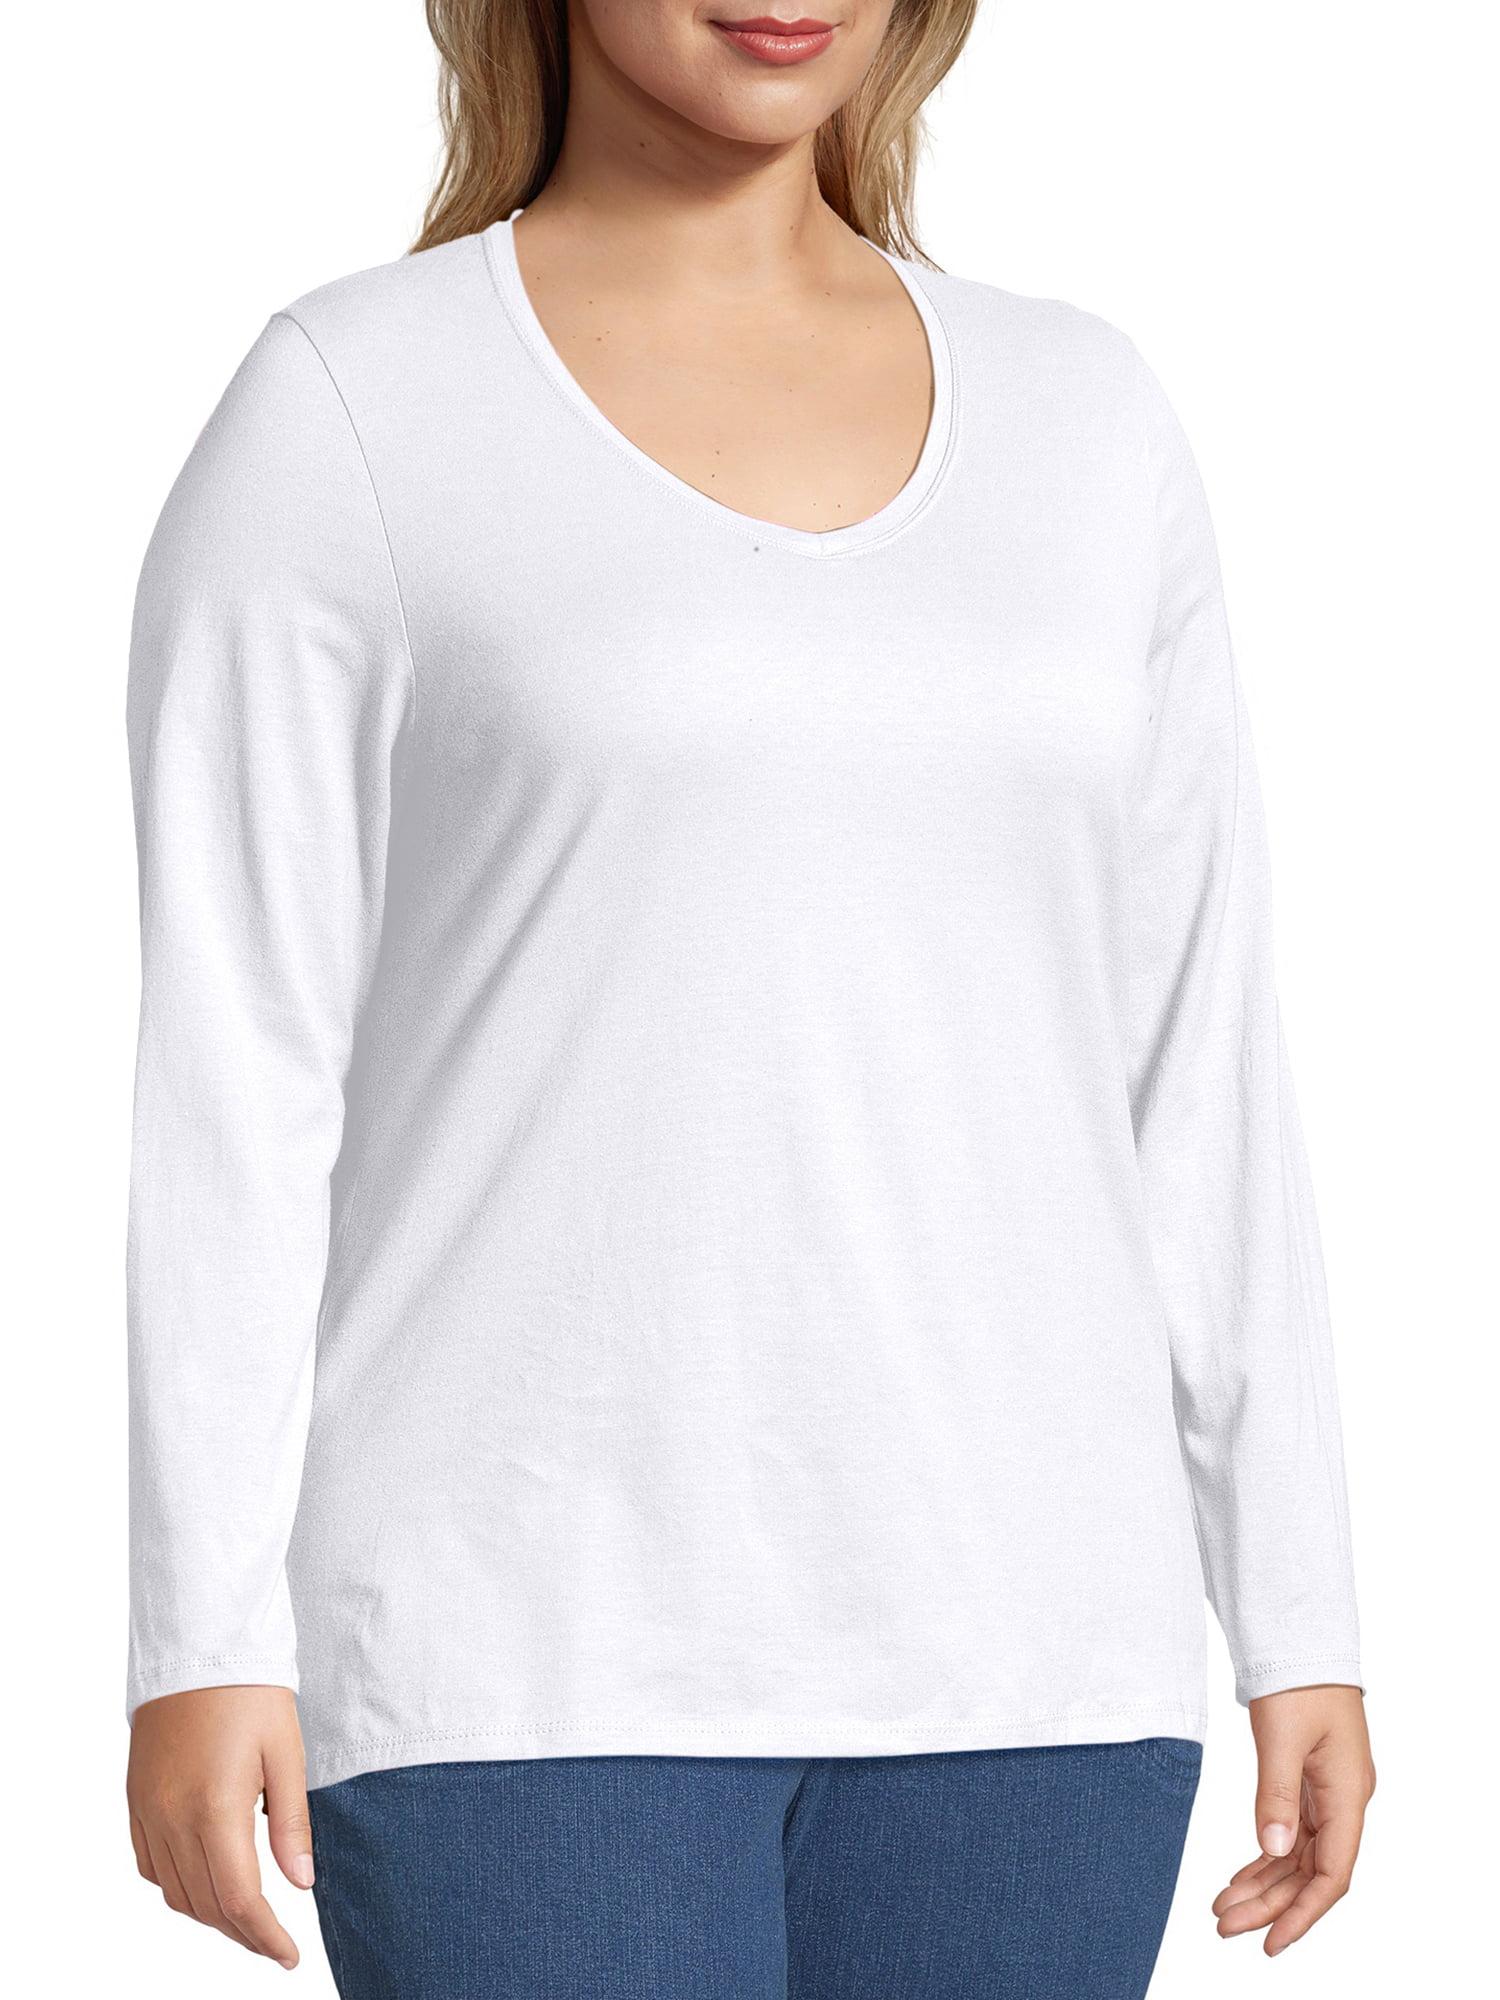 JXJHK Large Size Womens Shirt V-Neck Shirt Long Sleeve Loose Printed Womens T-Shirt